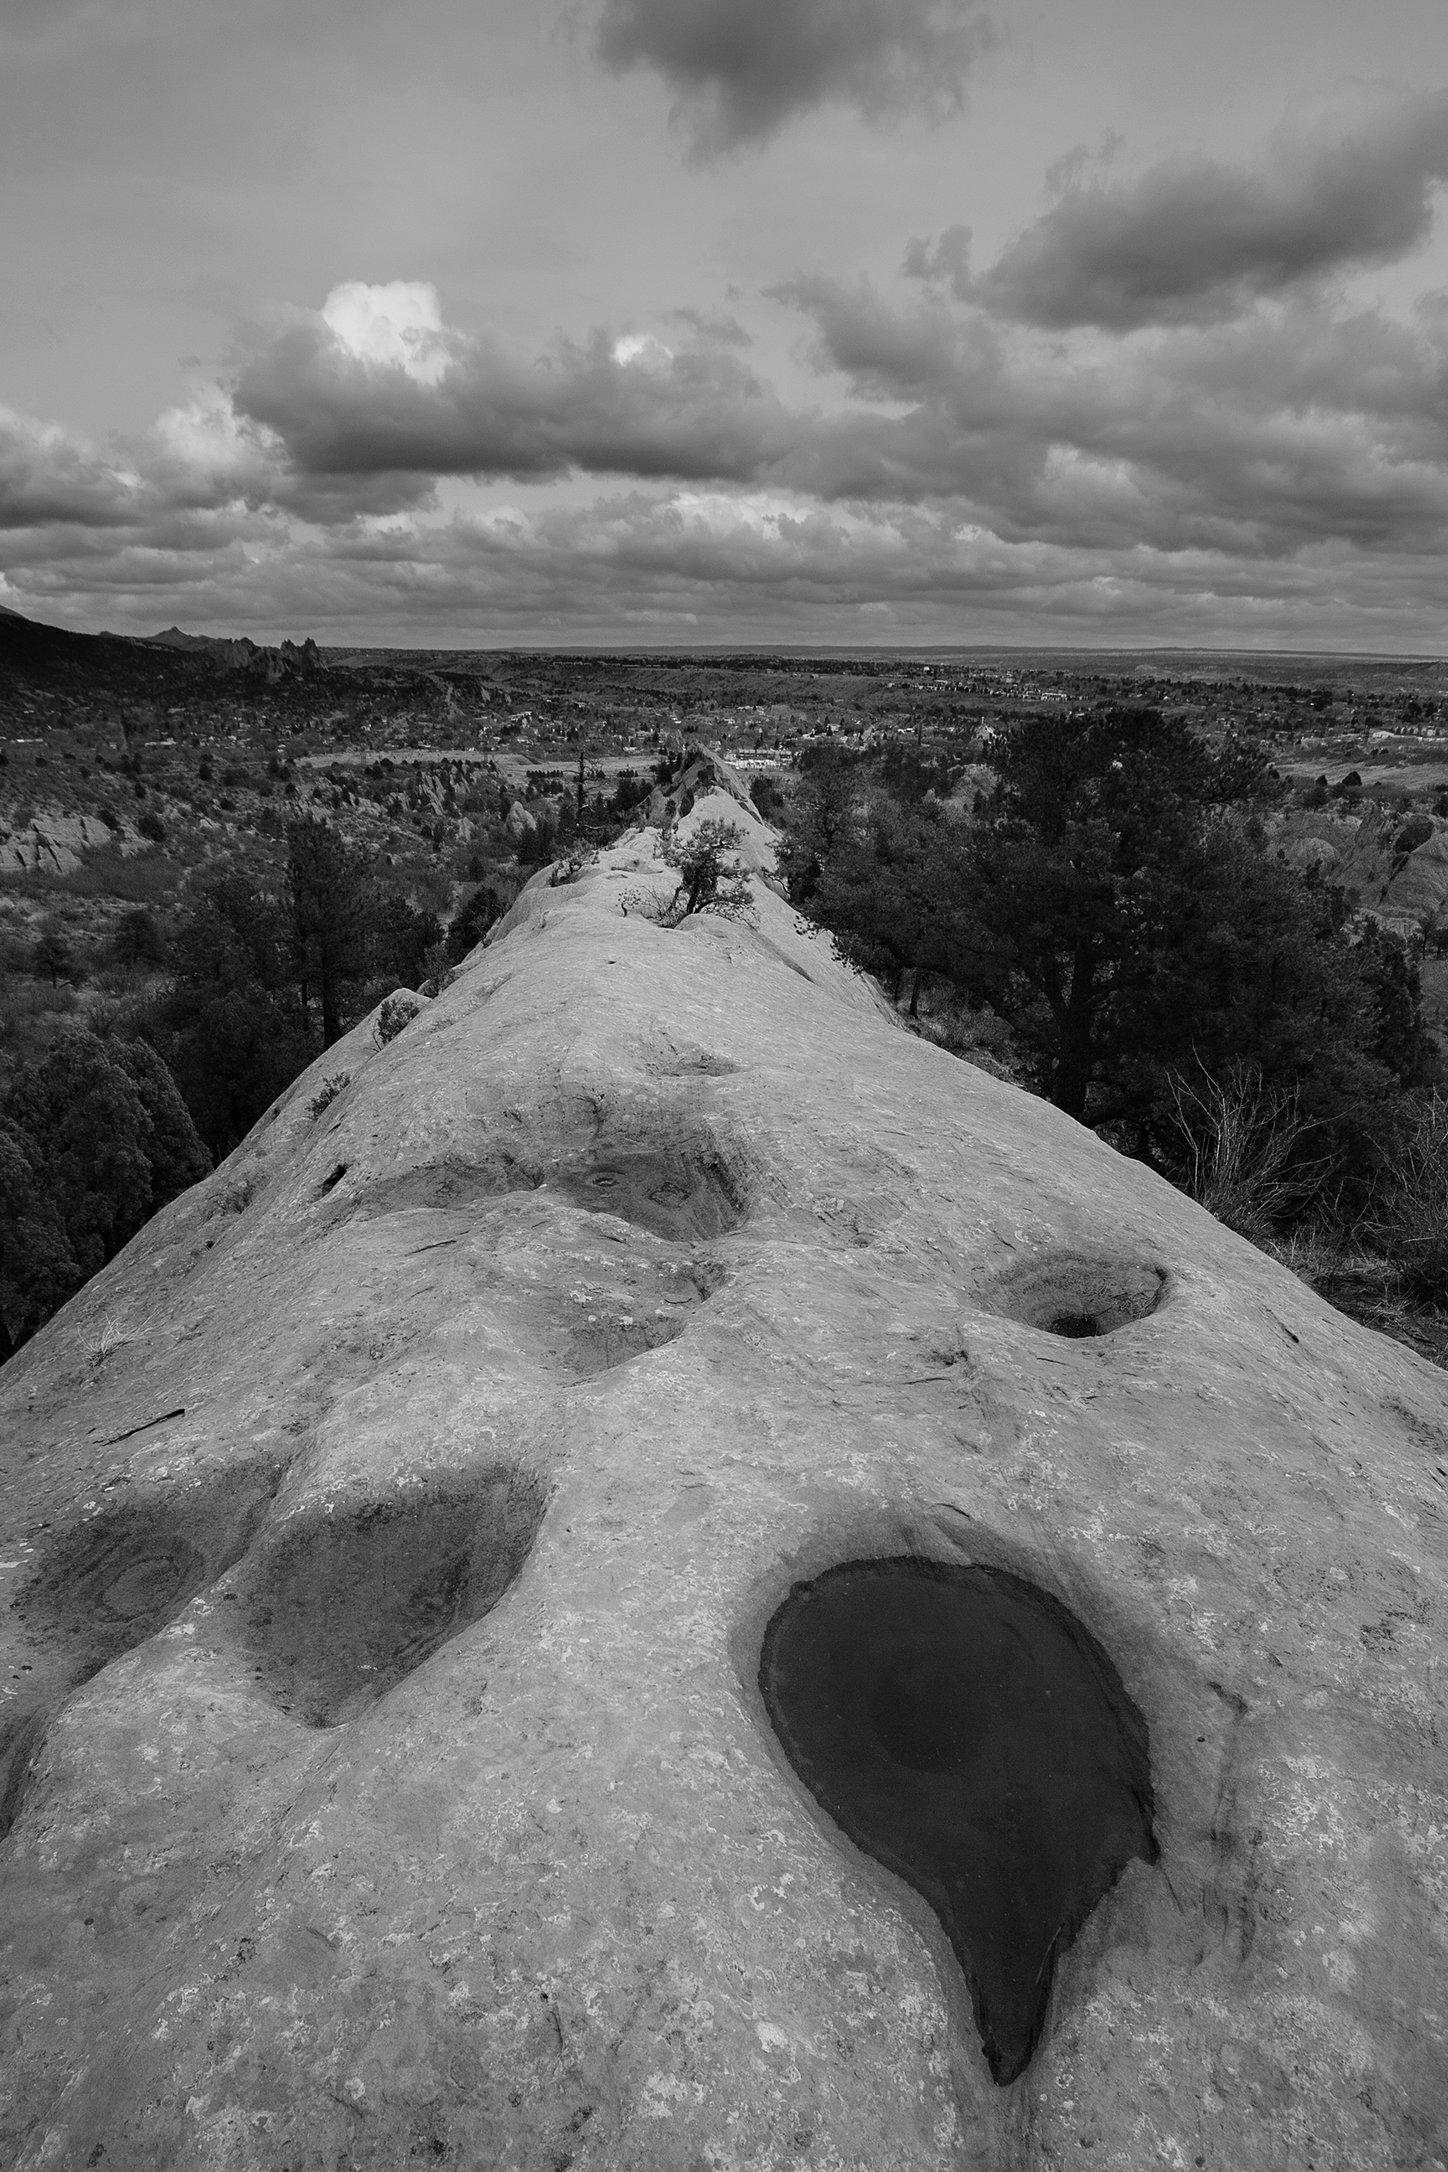 colorado-springs-landscape-black-and-white029.jpg